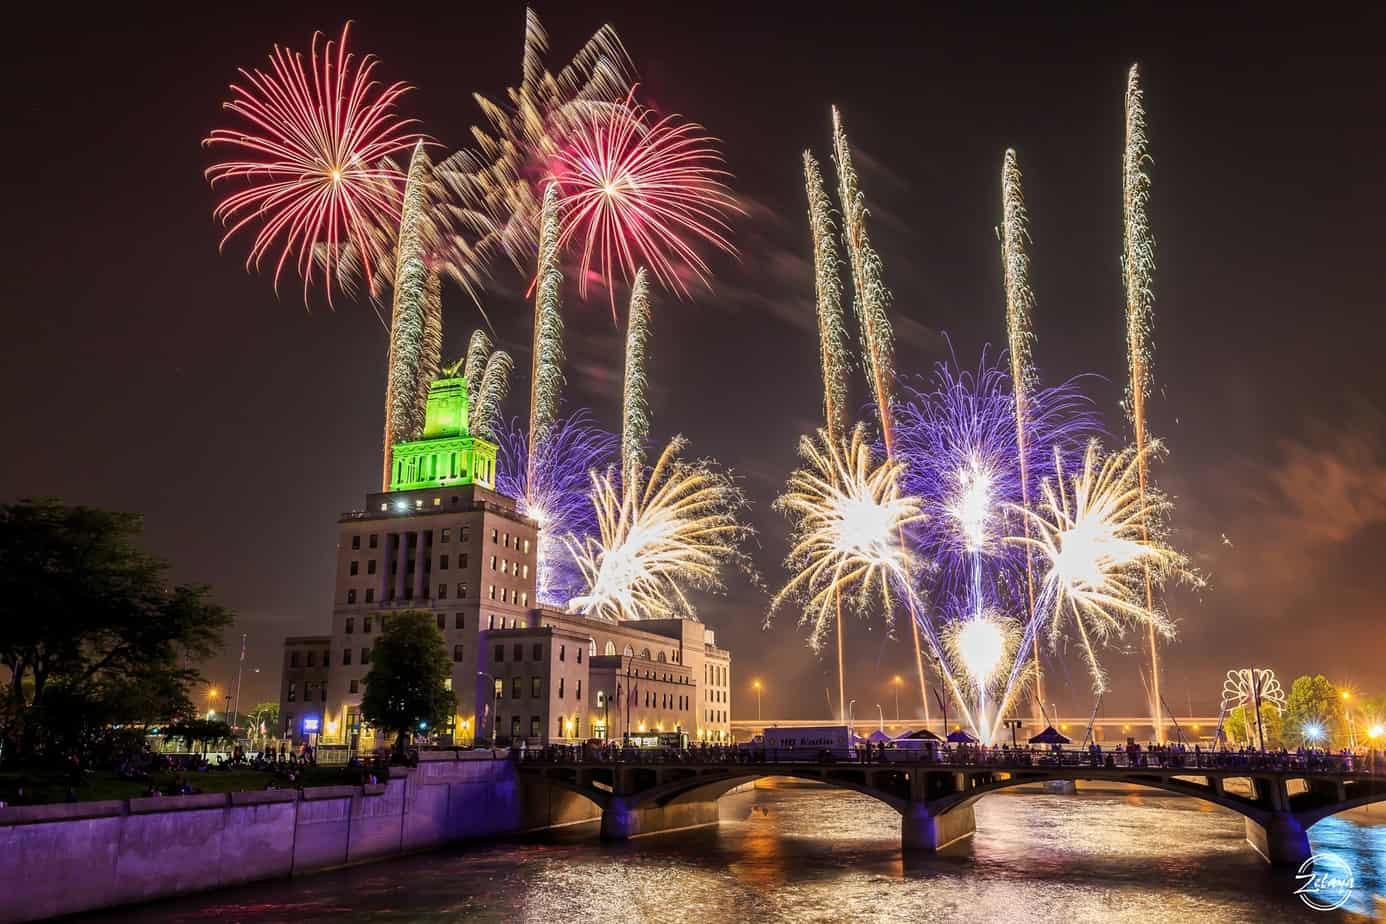 Cedar Rapids Iowa Freedom Festival Fireworks - 31Daily.com